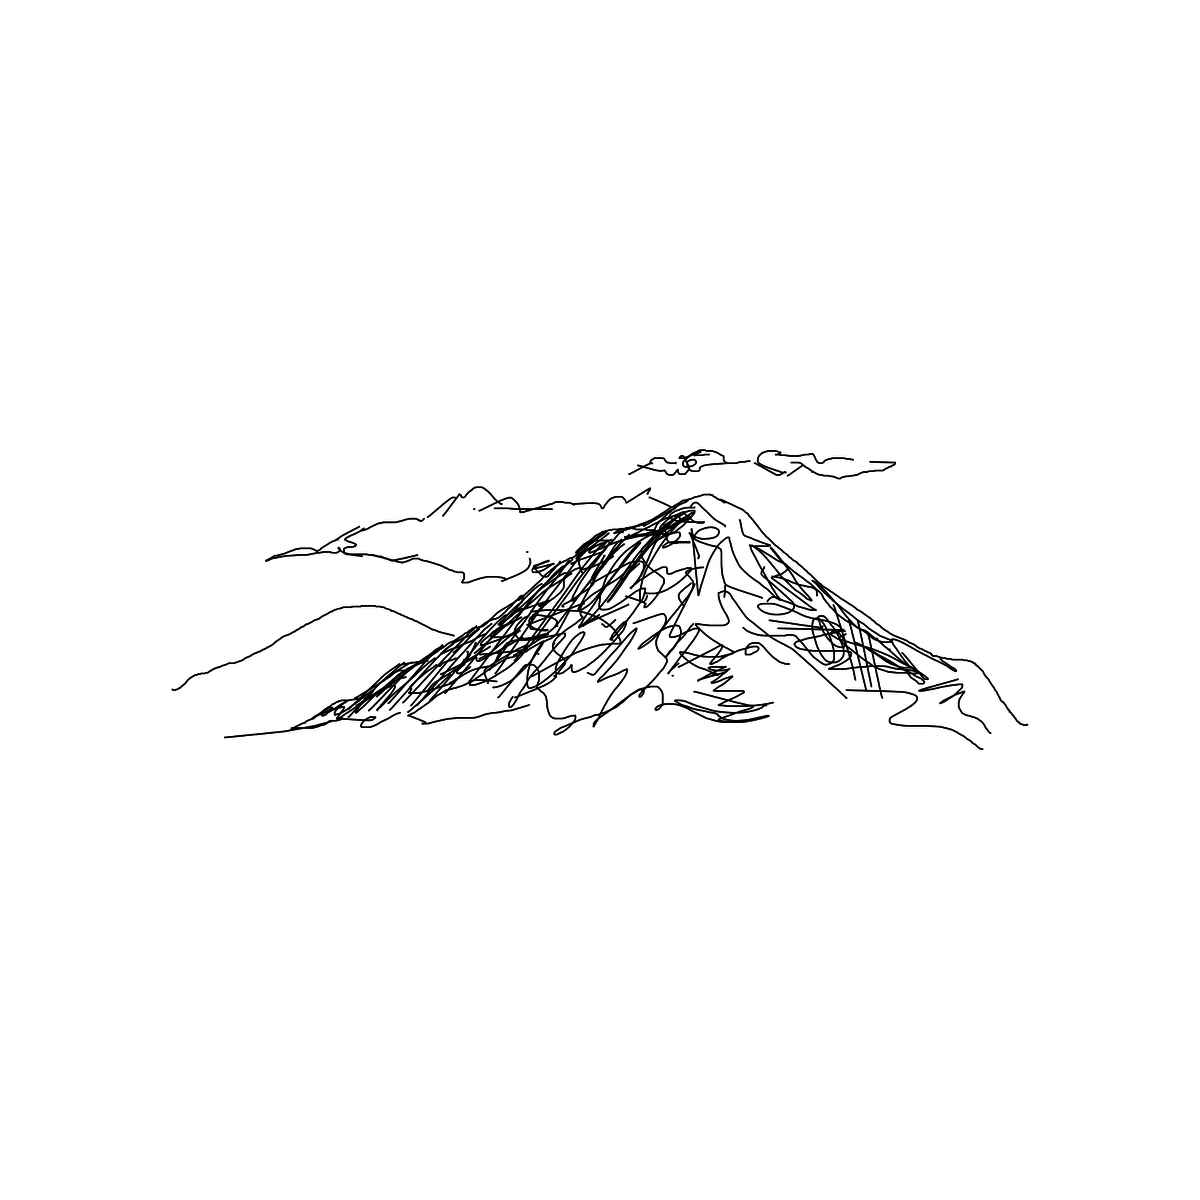 BAAAM drawing#5715 lat:43.0563774108886700lng: -89.3583602905273400